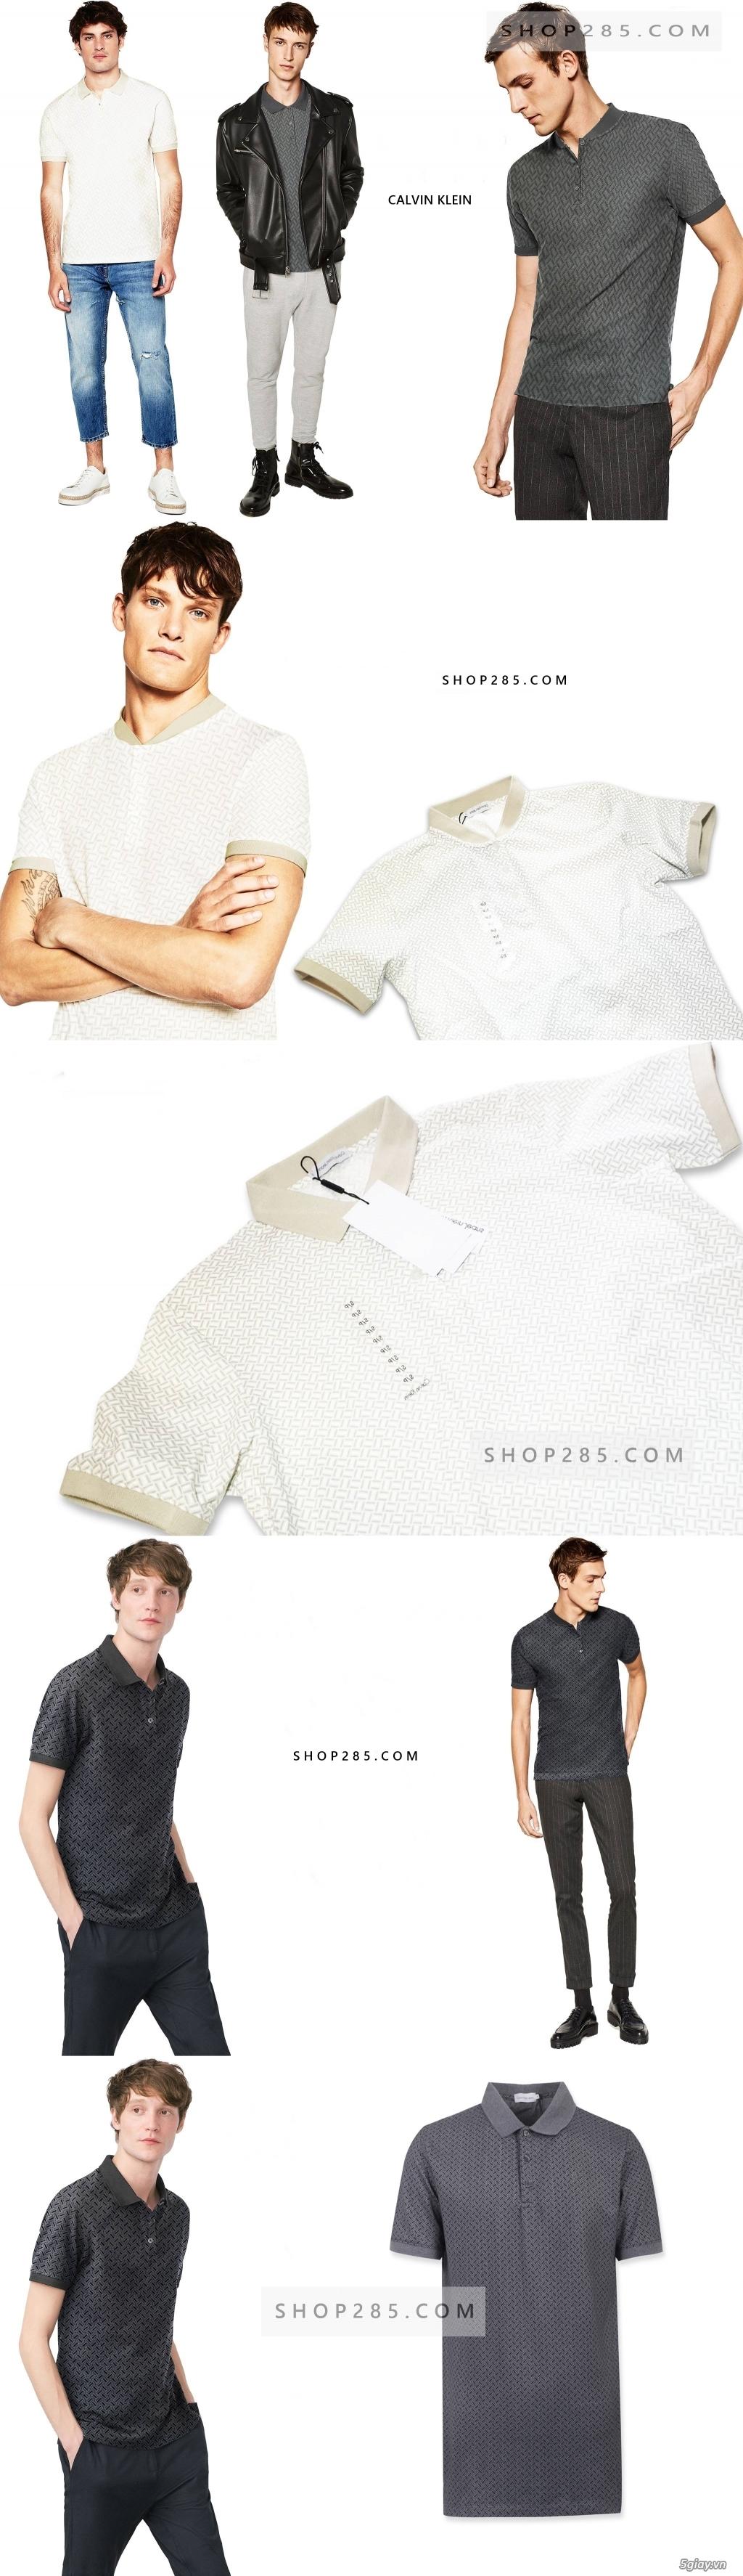 Shop285.com - Shop quần áo : Zara,Jules,Jake*s,,Hollister,Aber,CK,Tommy,Levis - 21